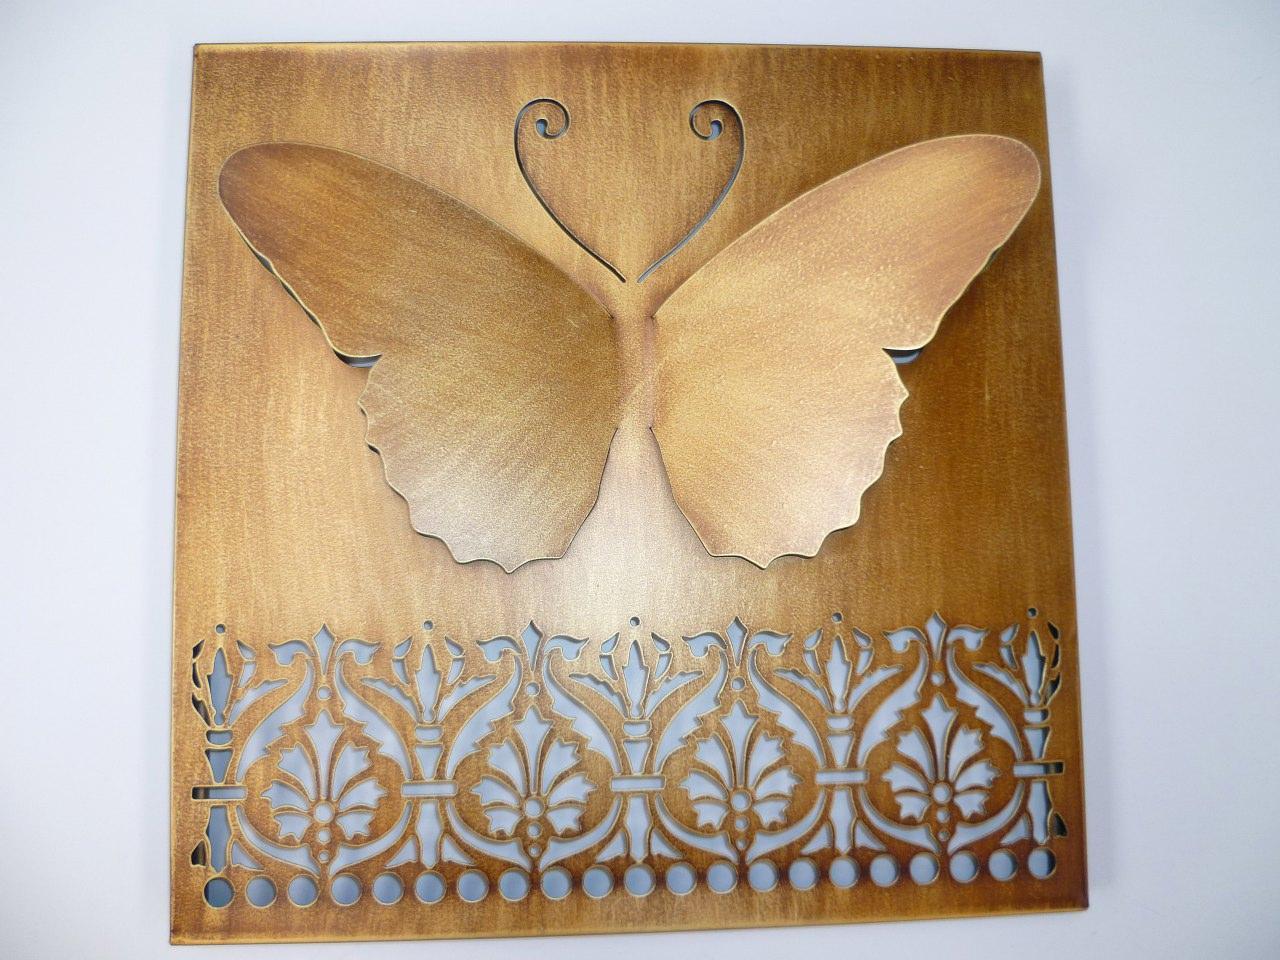 Gold Square Wall Decor : Metal wall art gold framed laser cut d butterfly cm